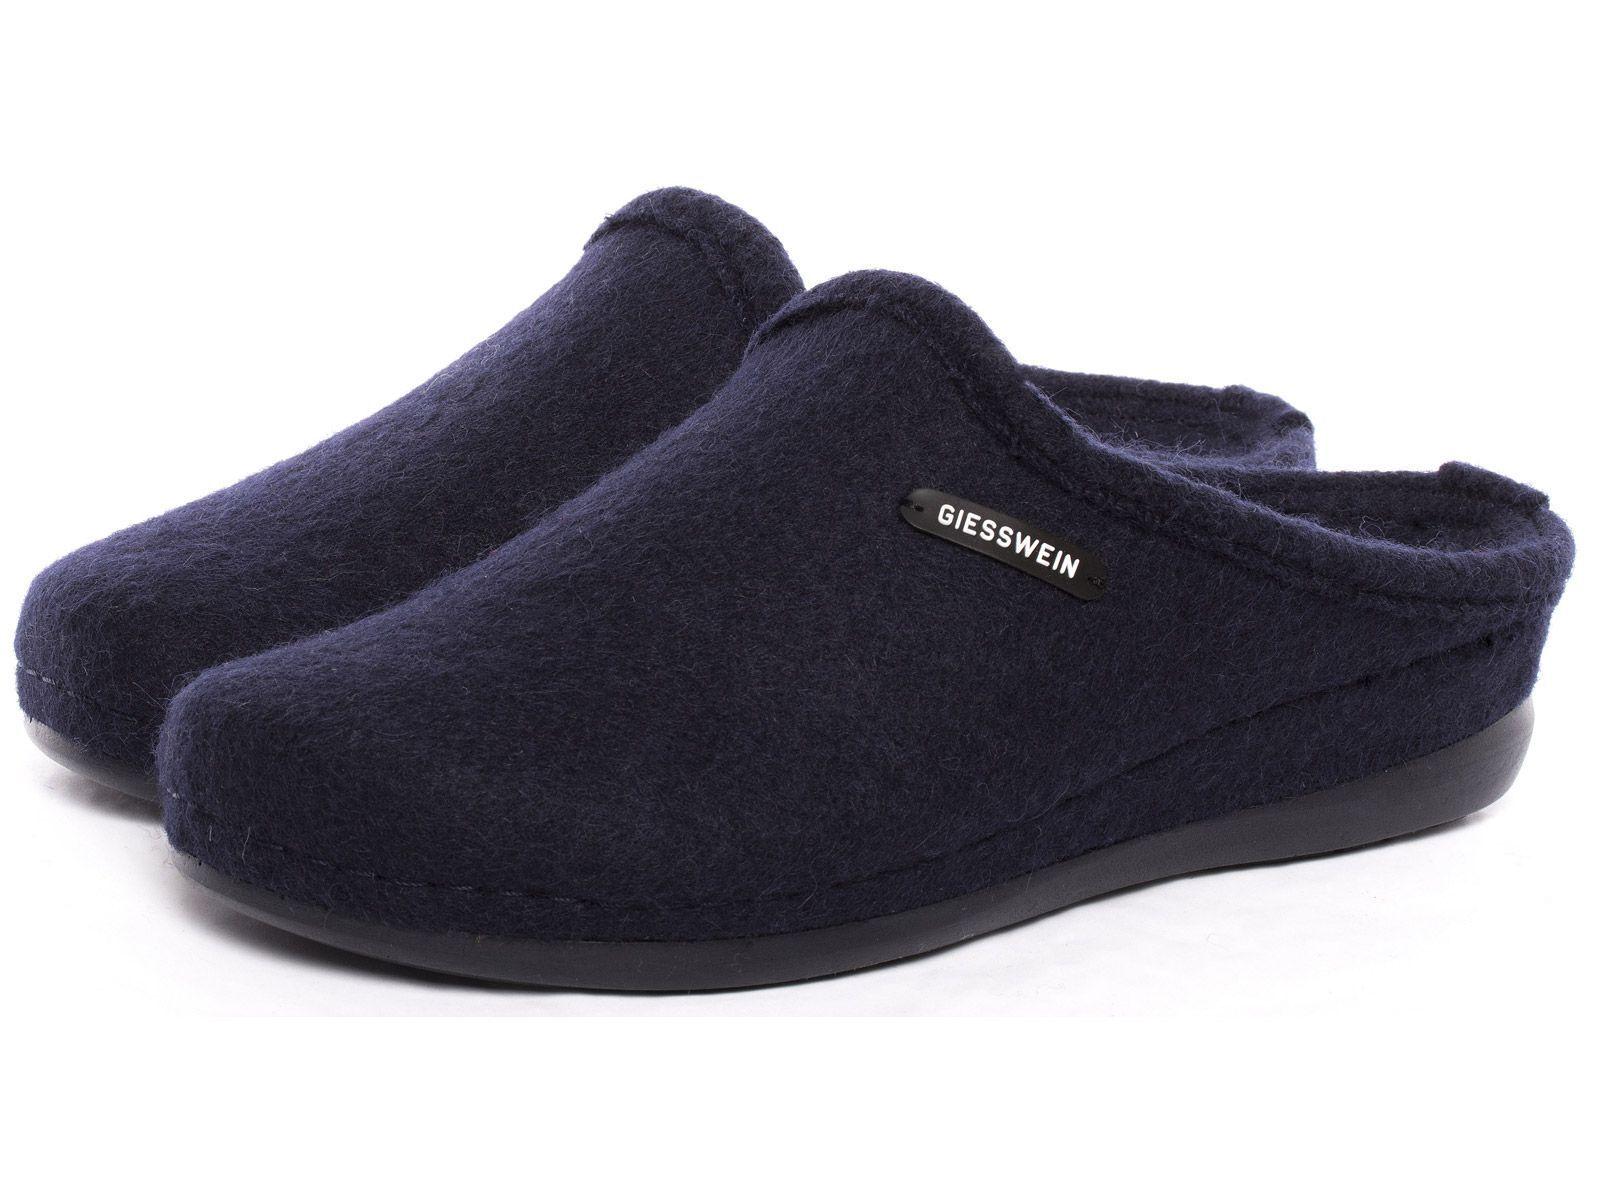 Giesswein Pantofole Jena Ciabatte Blu 38 - 42 feltro suola Comfort Slipper